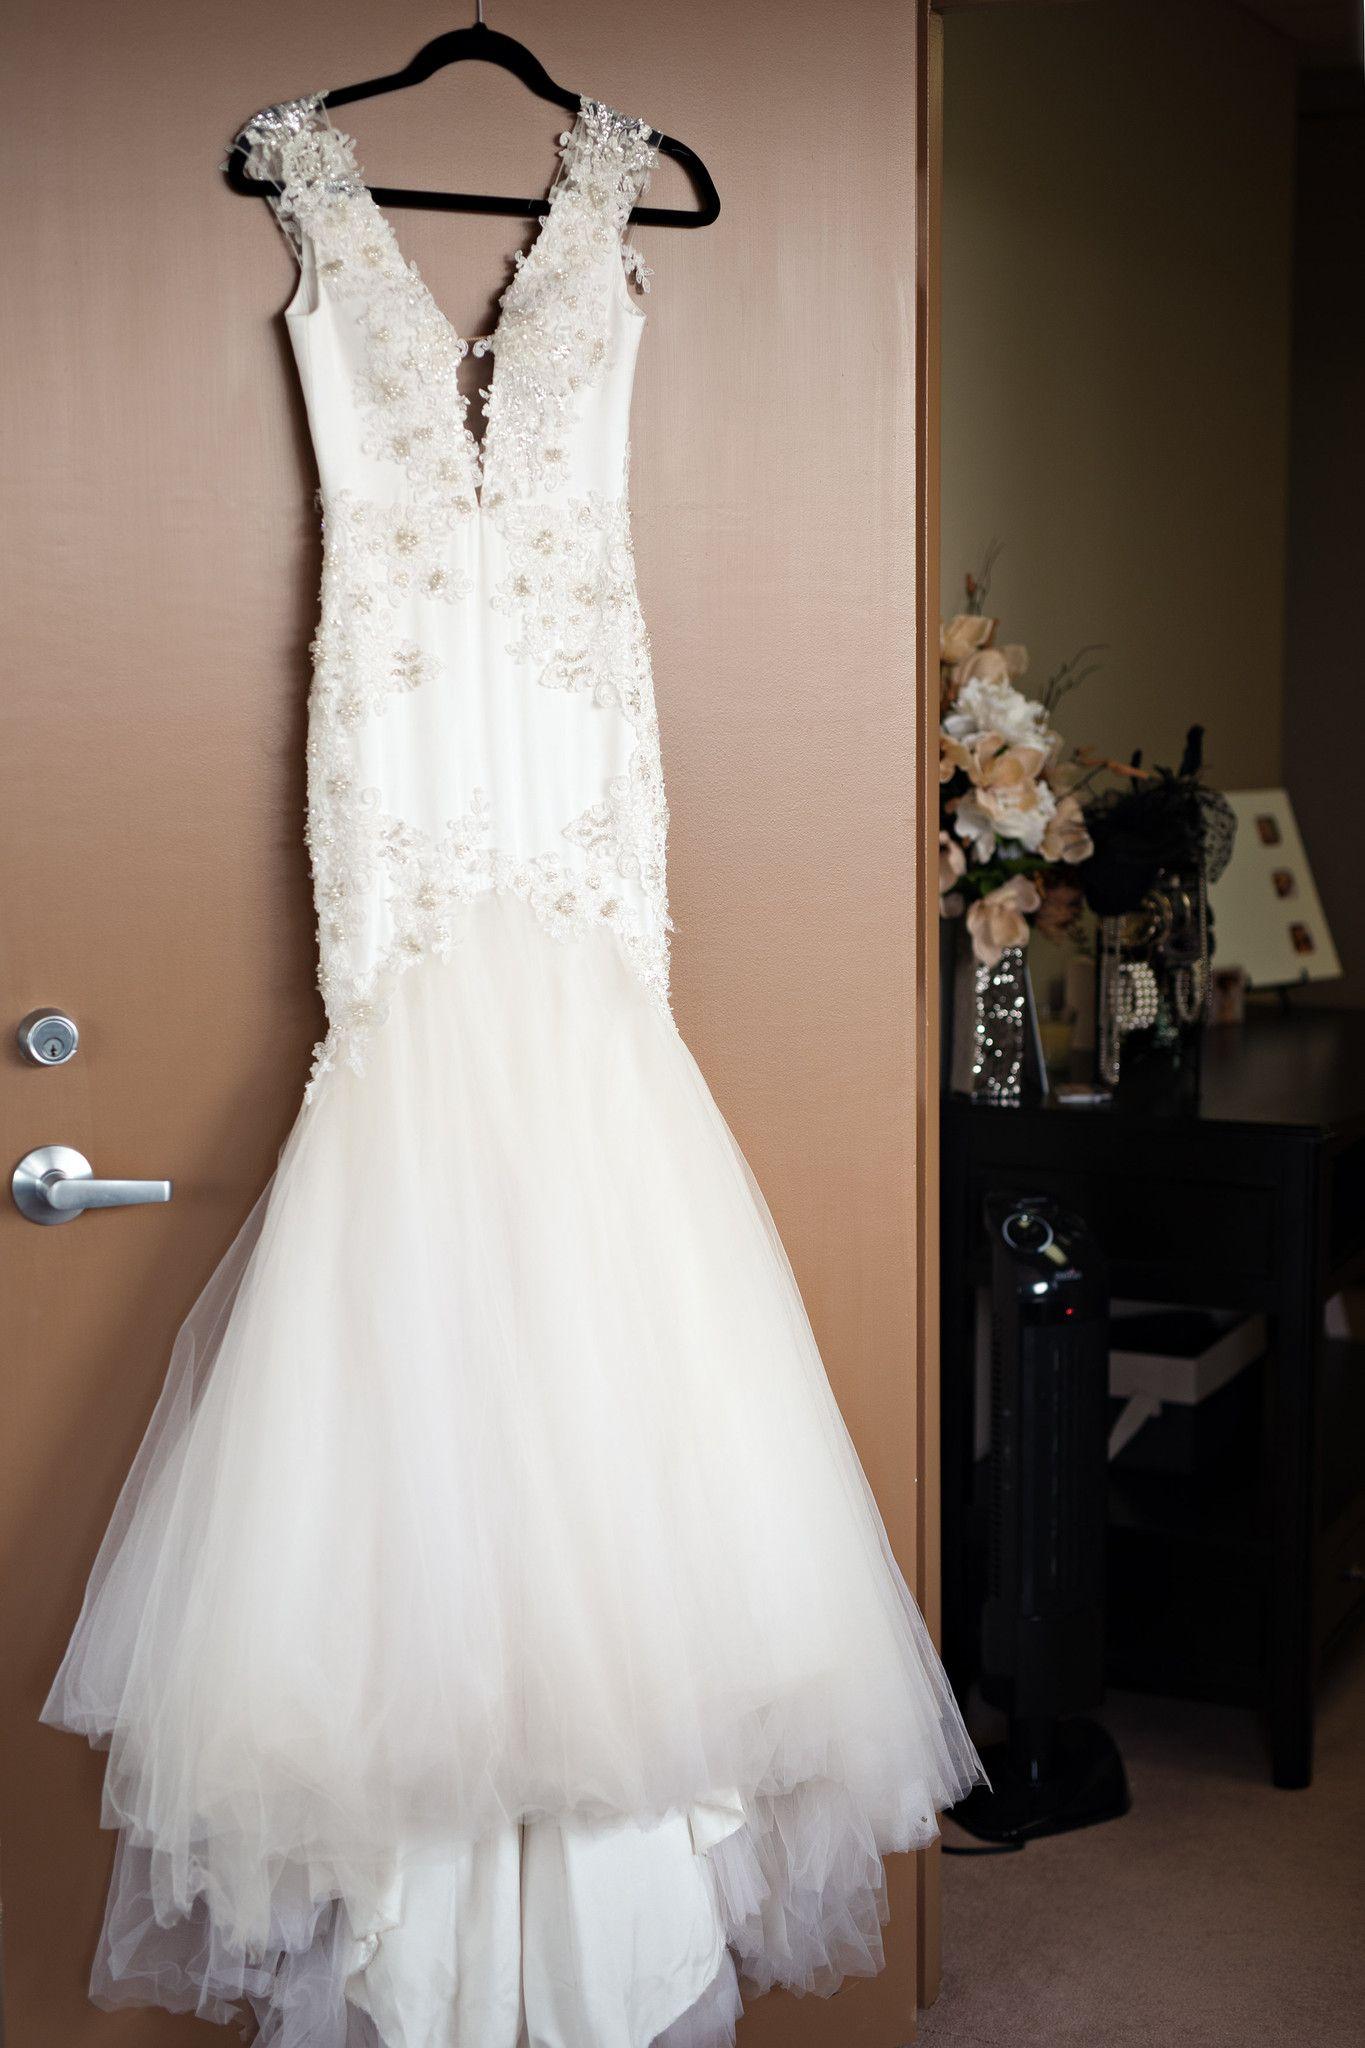 White mermaid wedding dress  Sexy Couture Mermaid Wedding Dress With Deep V Neckline Style